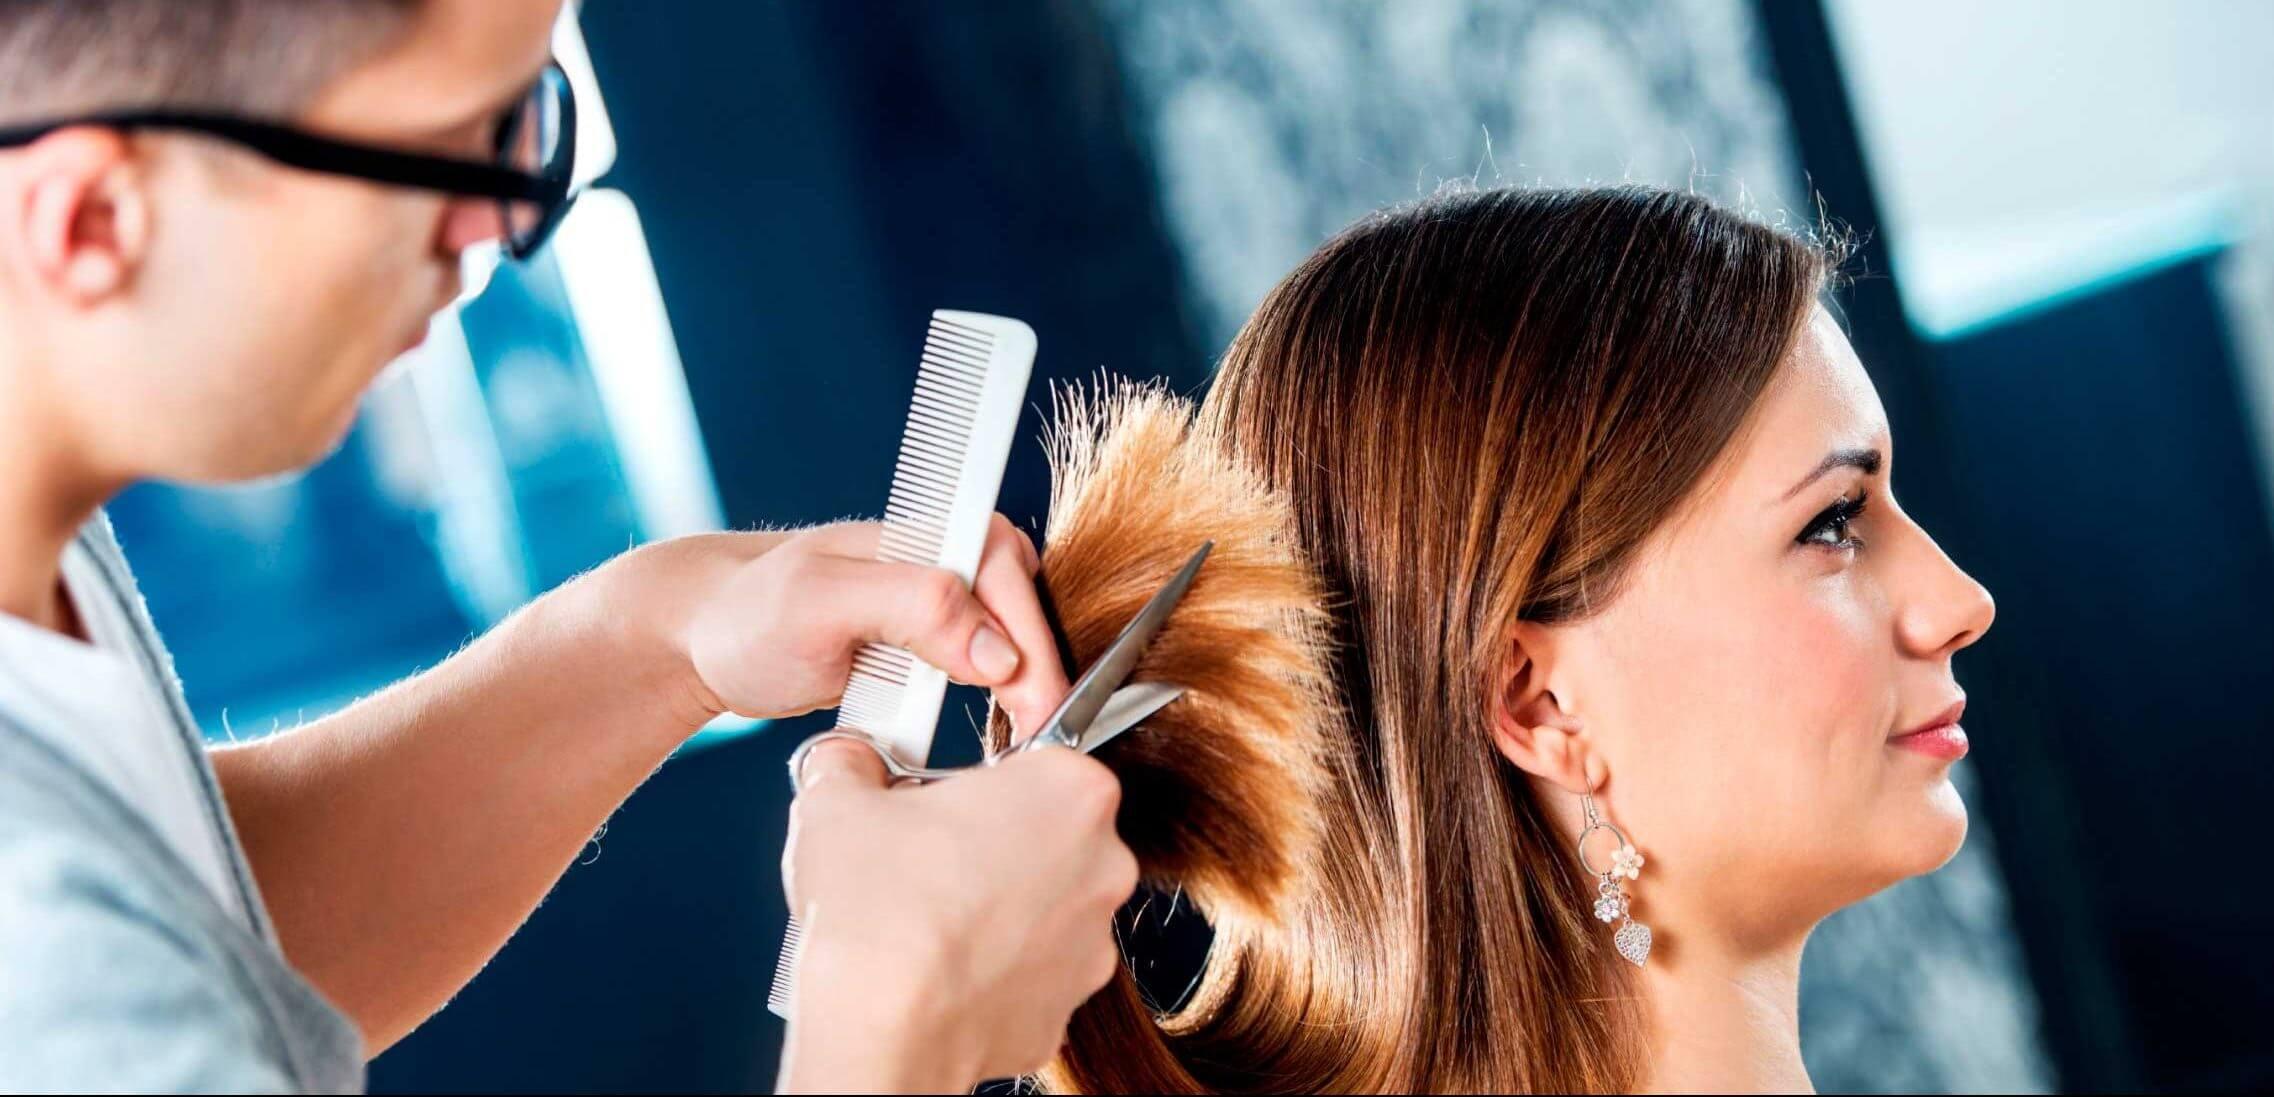 cosmetology, beauty school, careers